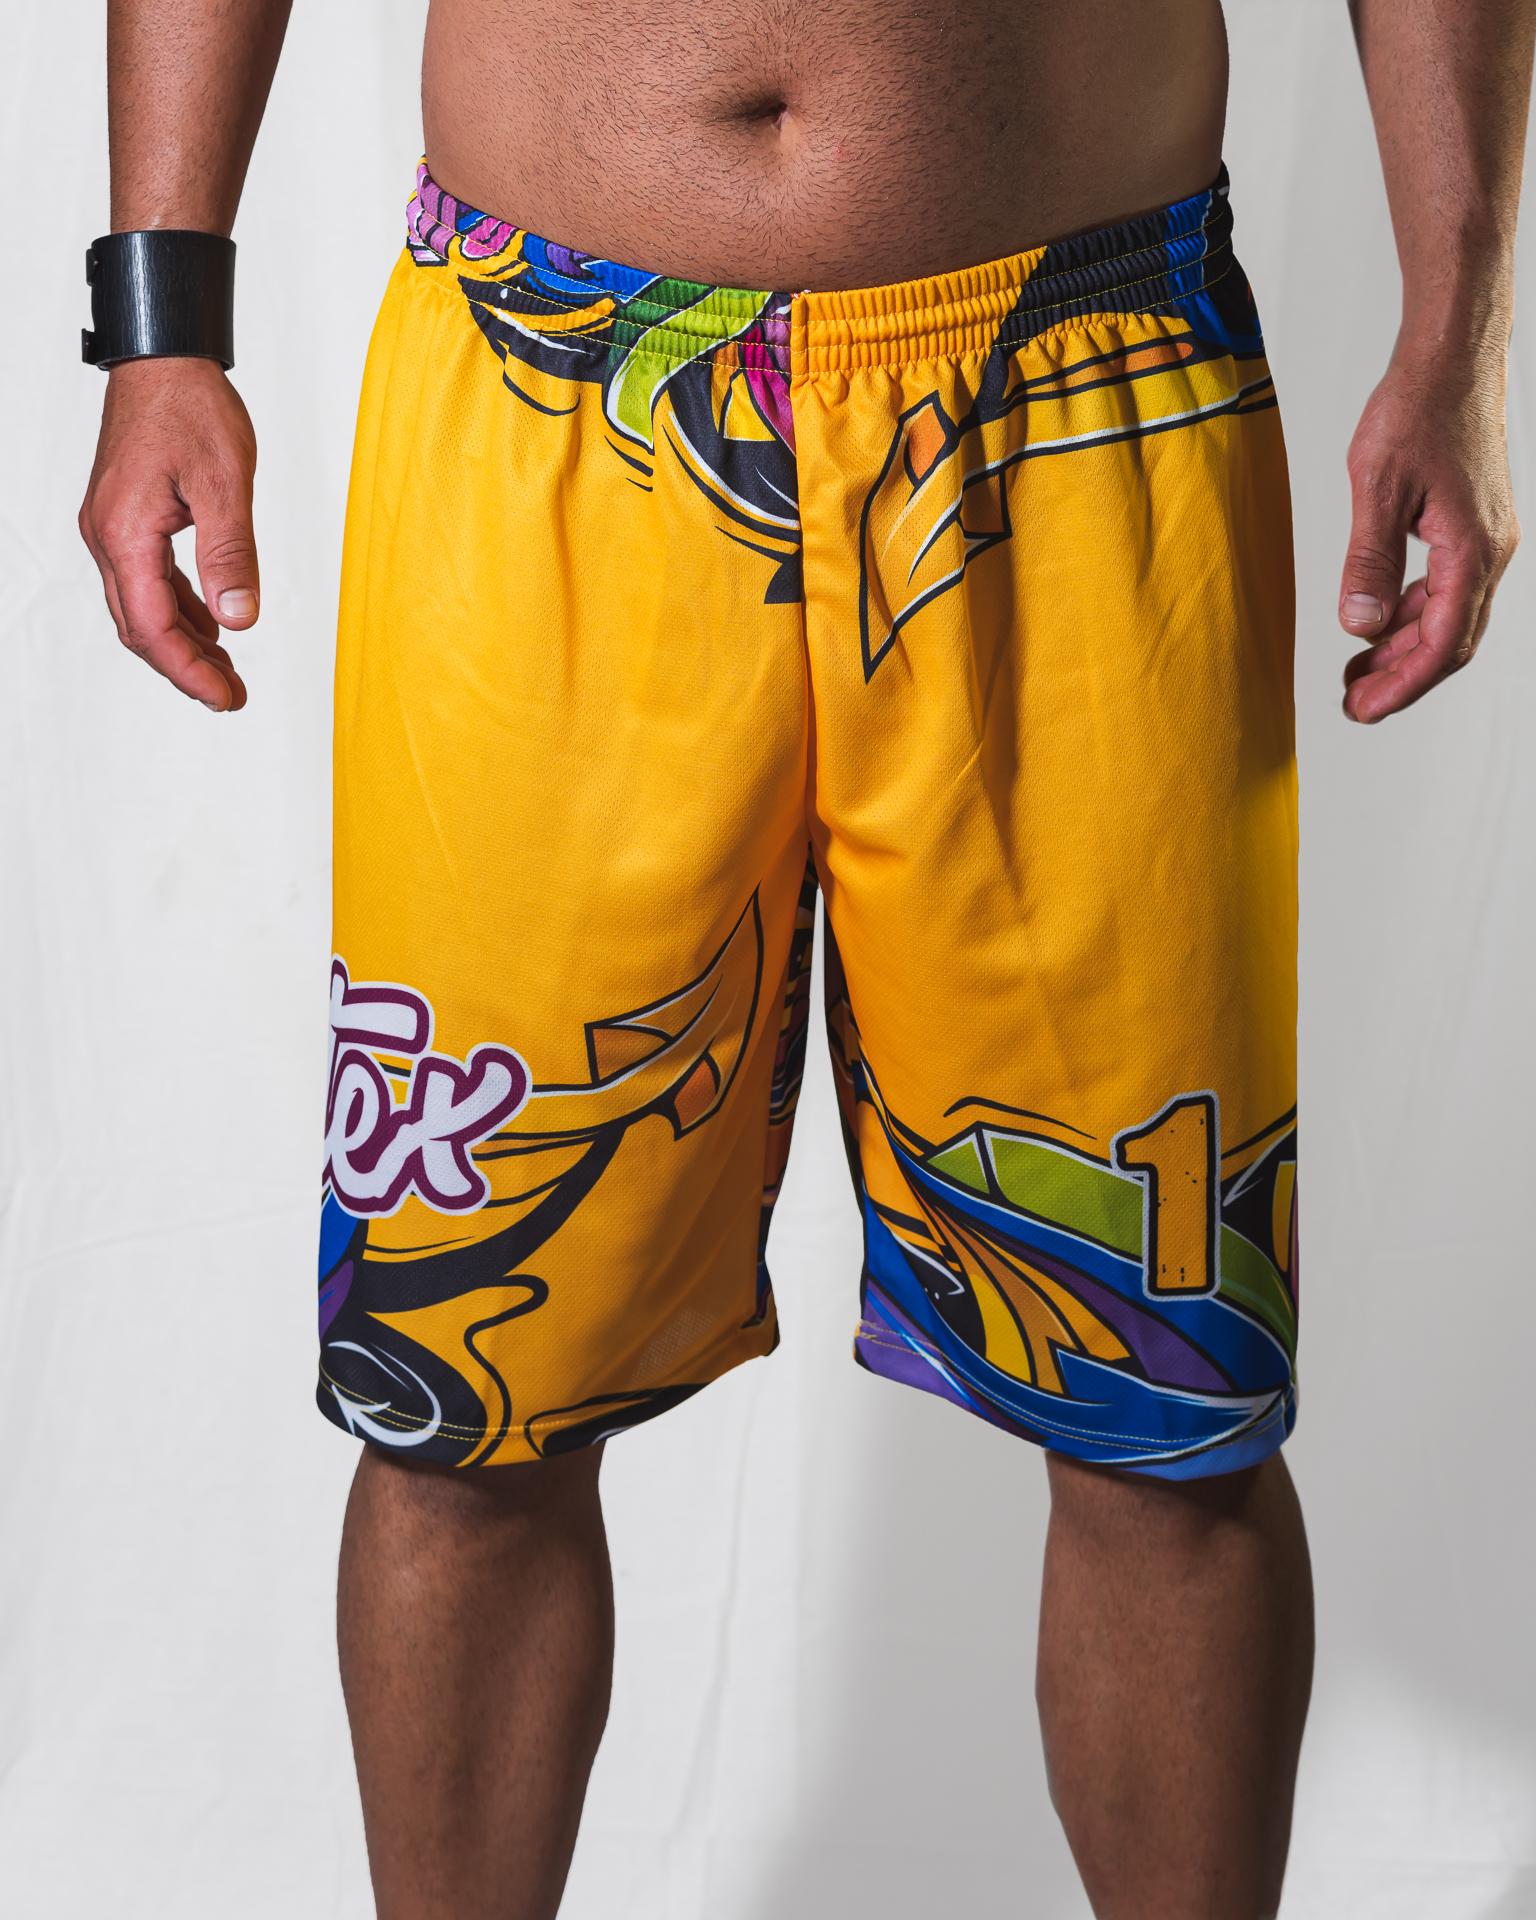 FOOTEX Pantaloncino Beach Volley MONKEY Made in Italy Sconti Squadre Società